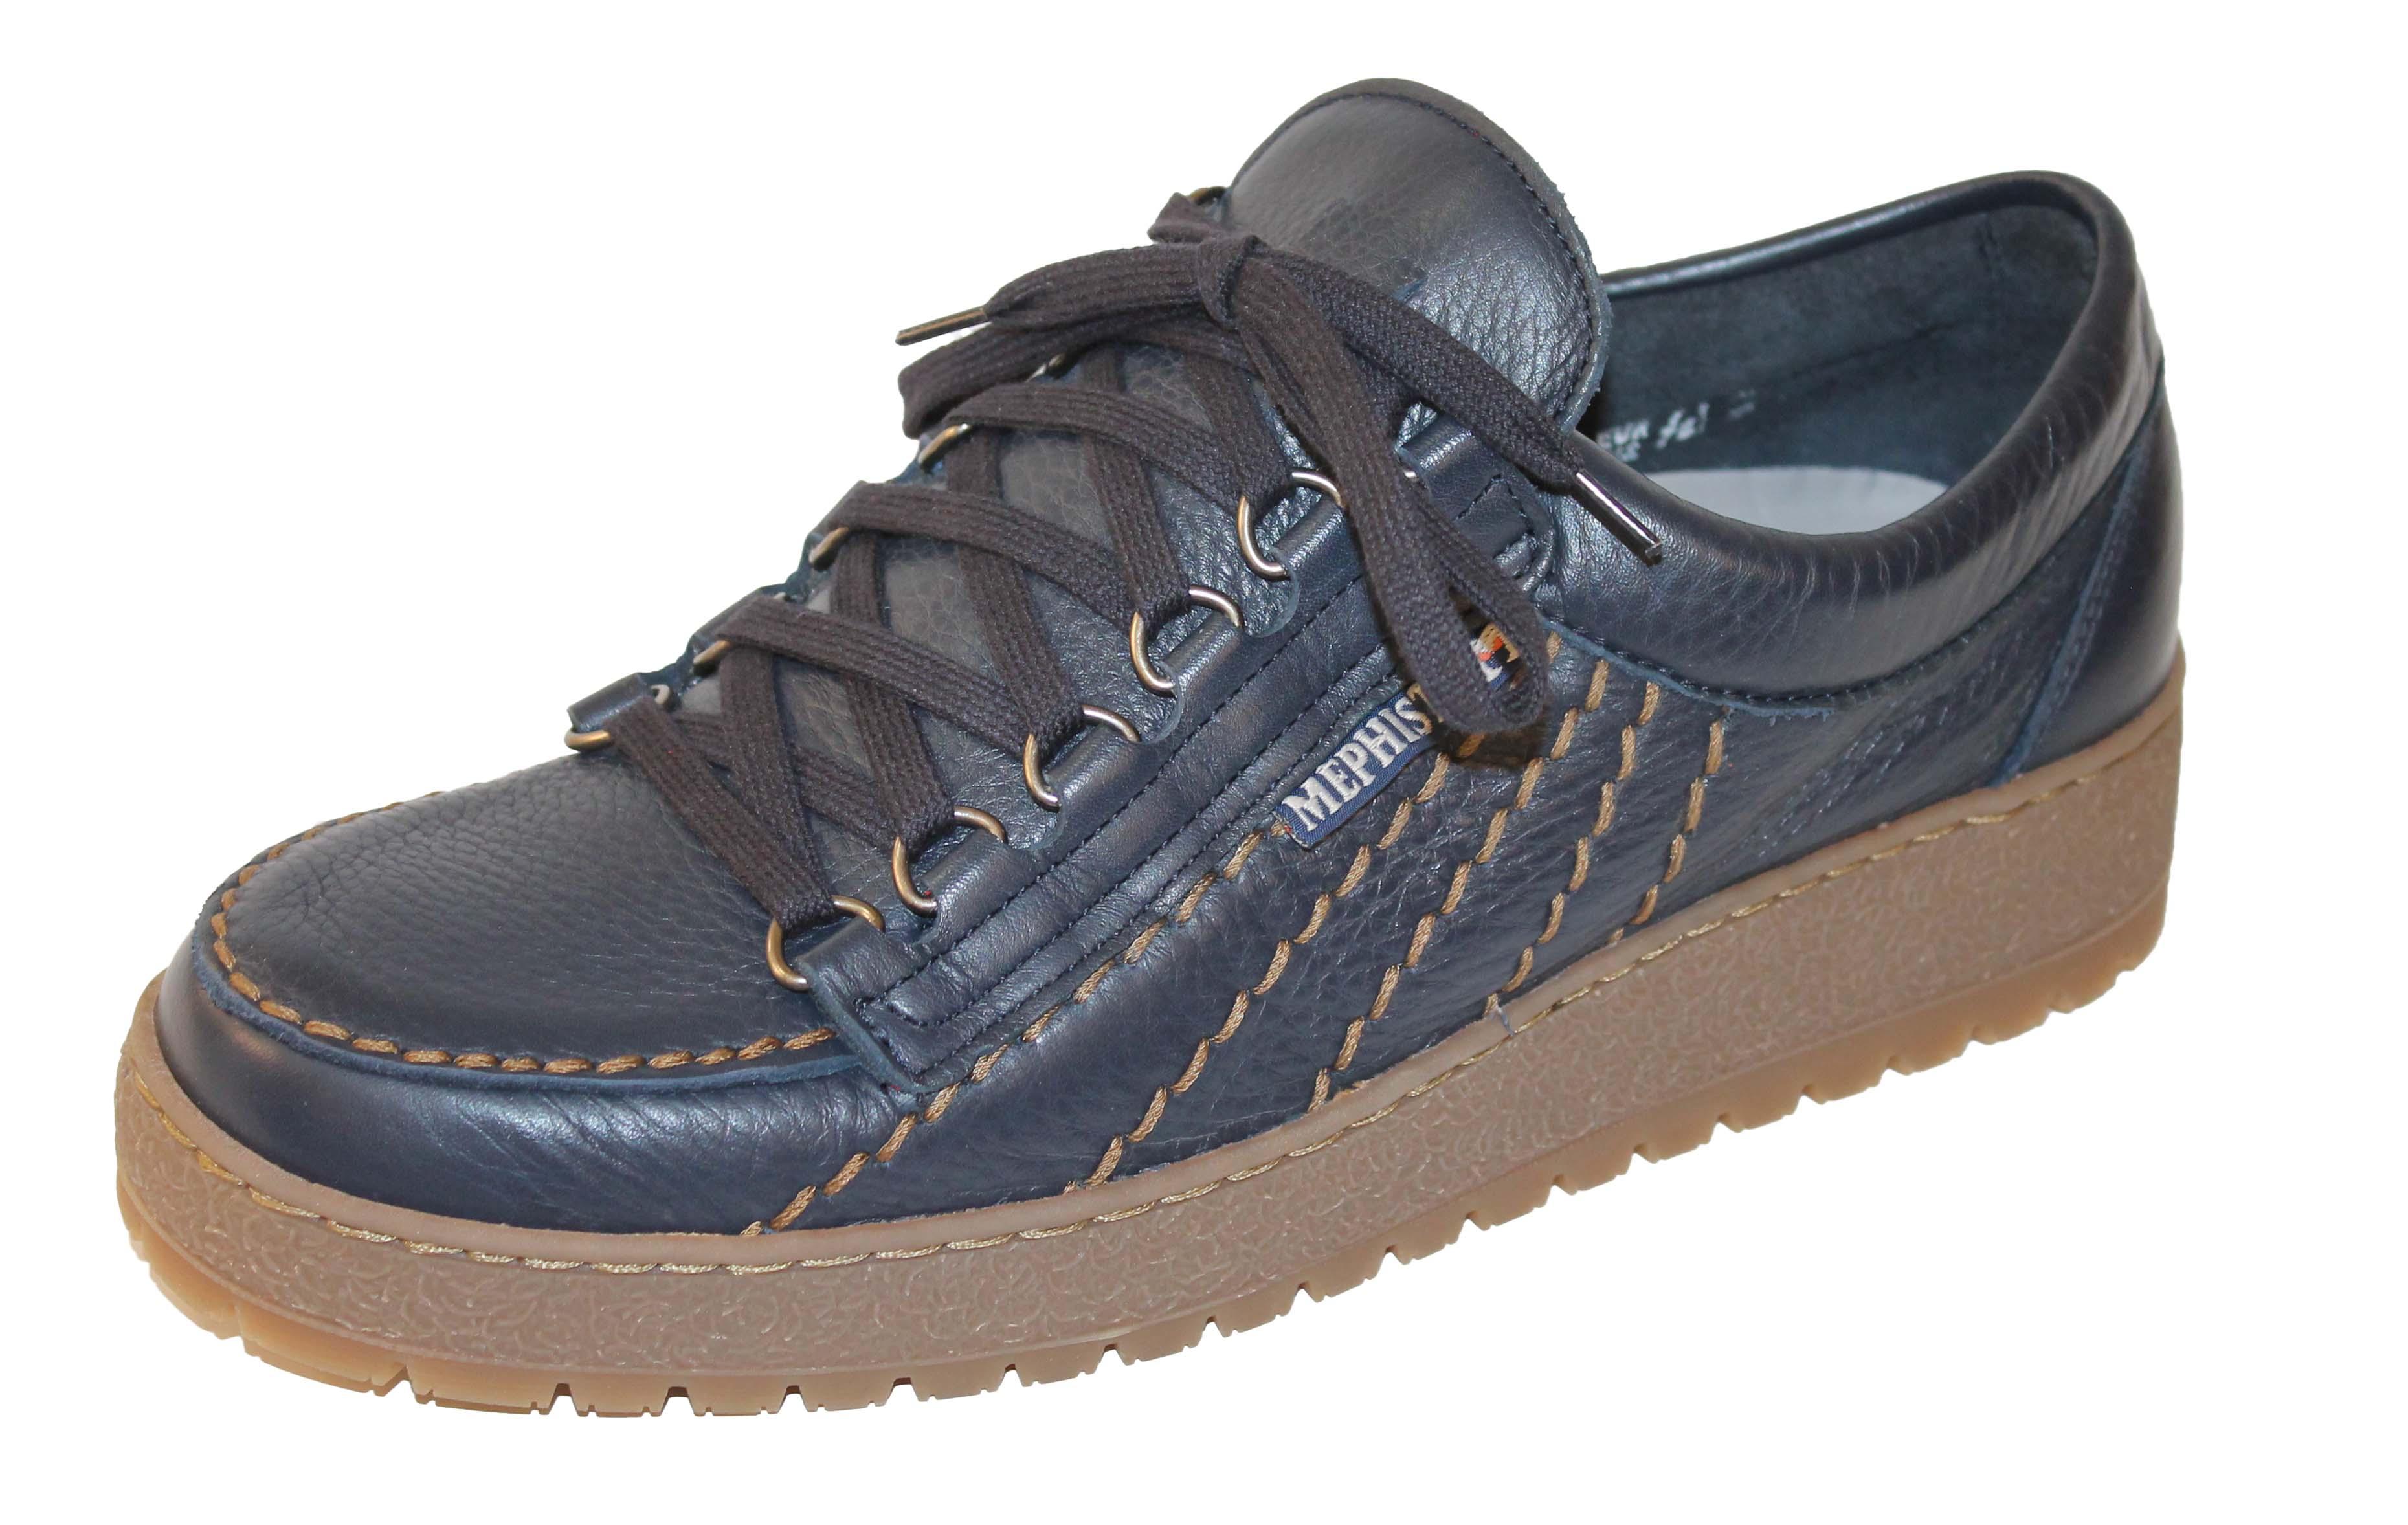 new arrival e3127 899ad MEPHISTO RAINBOW scarpa stringata in pelle (BLU)